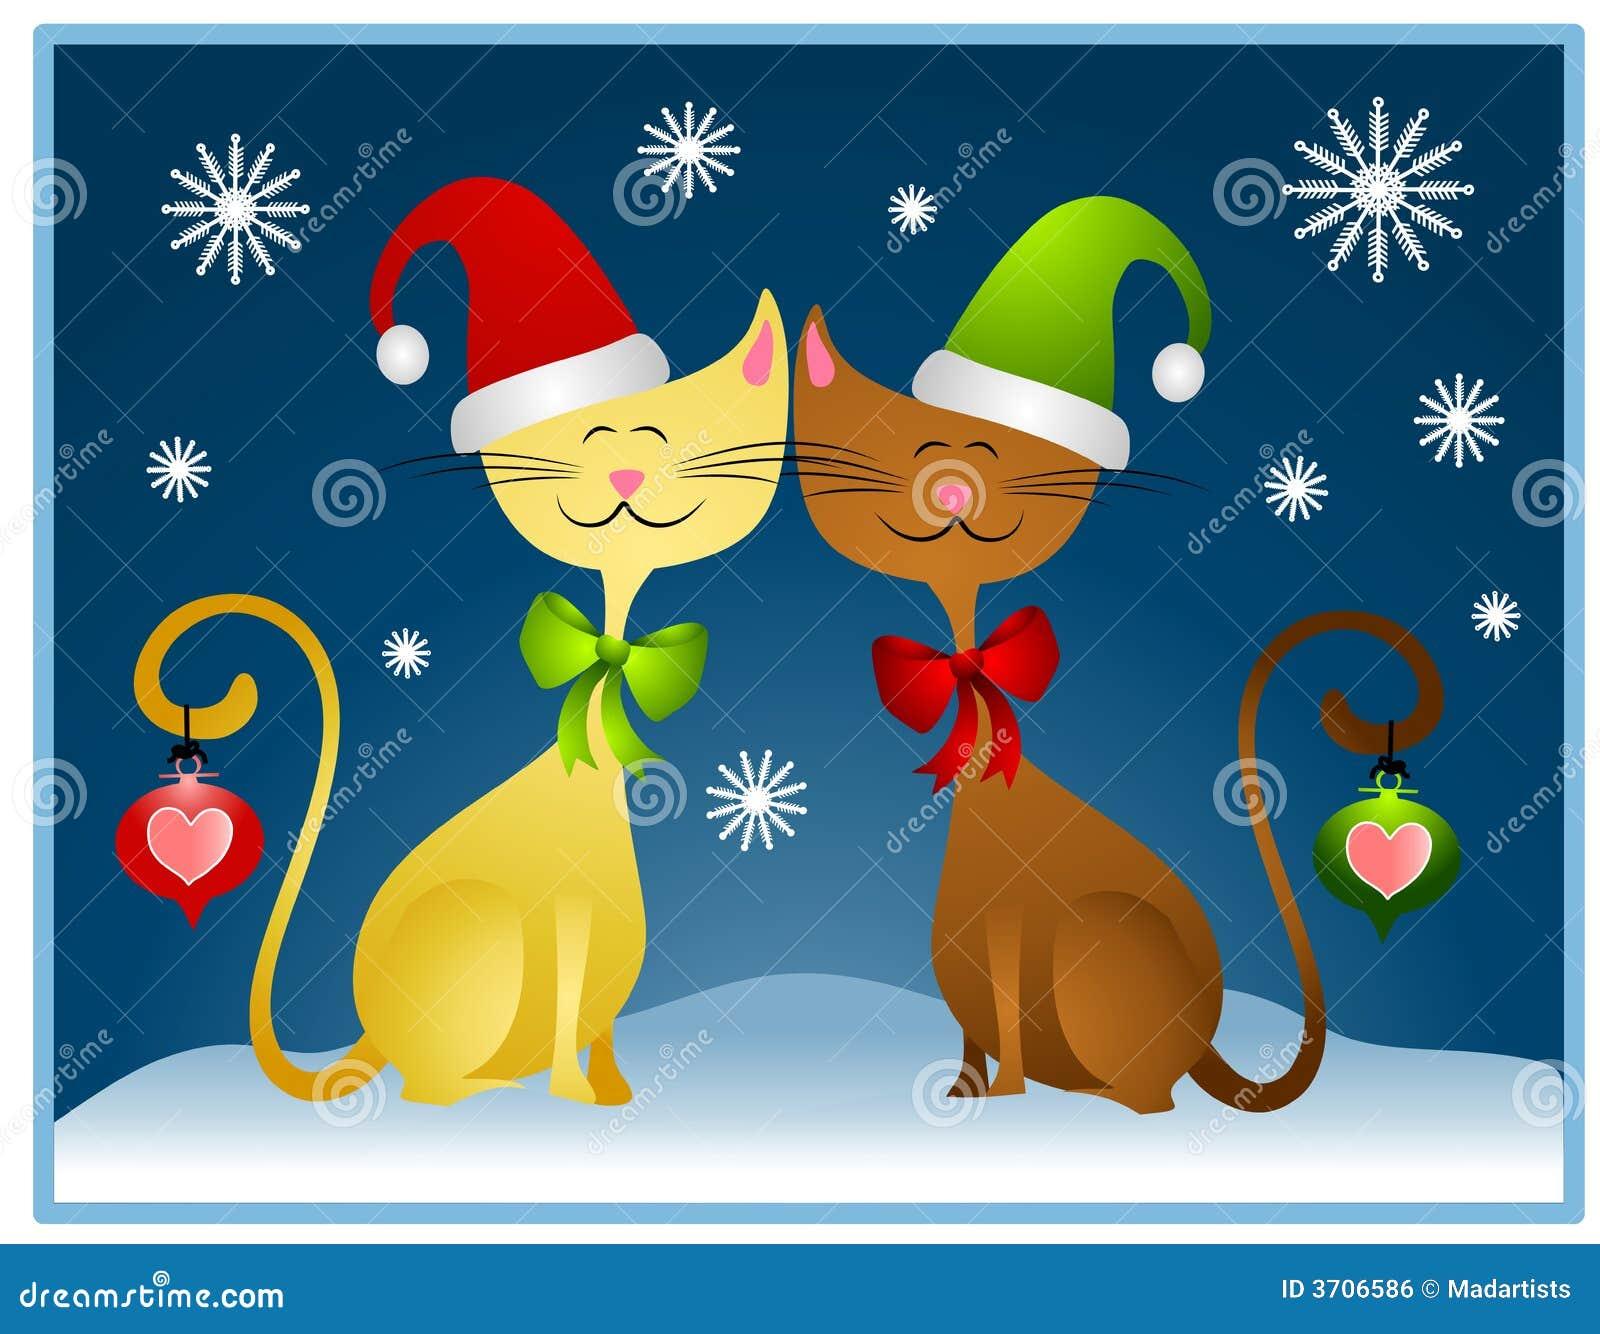 cartoon christmas cats holiday card - Holiday Cartoons Free